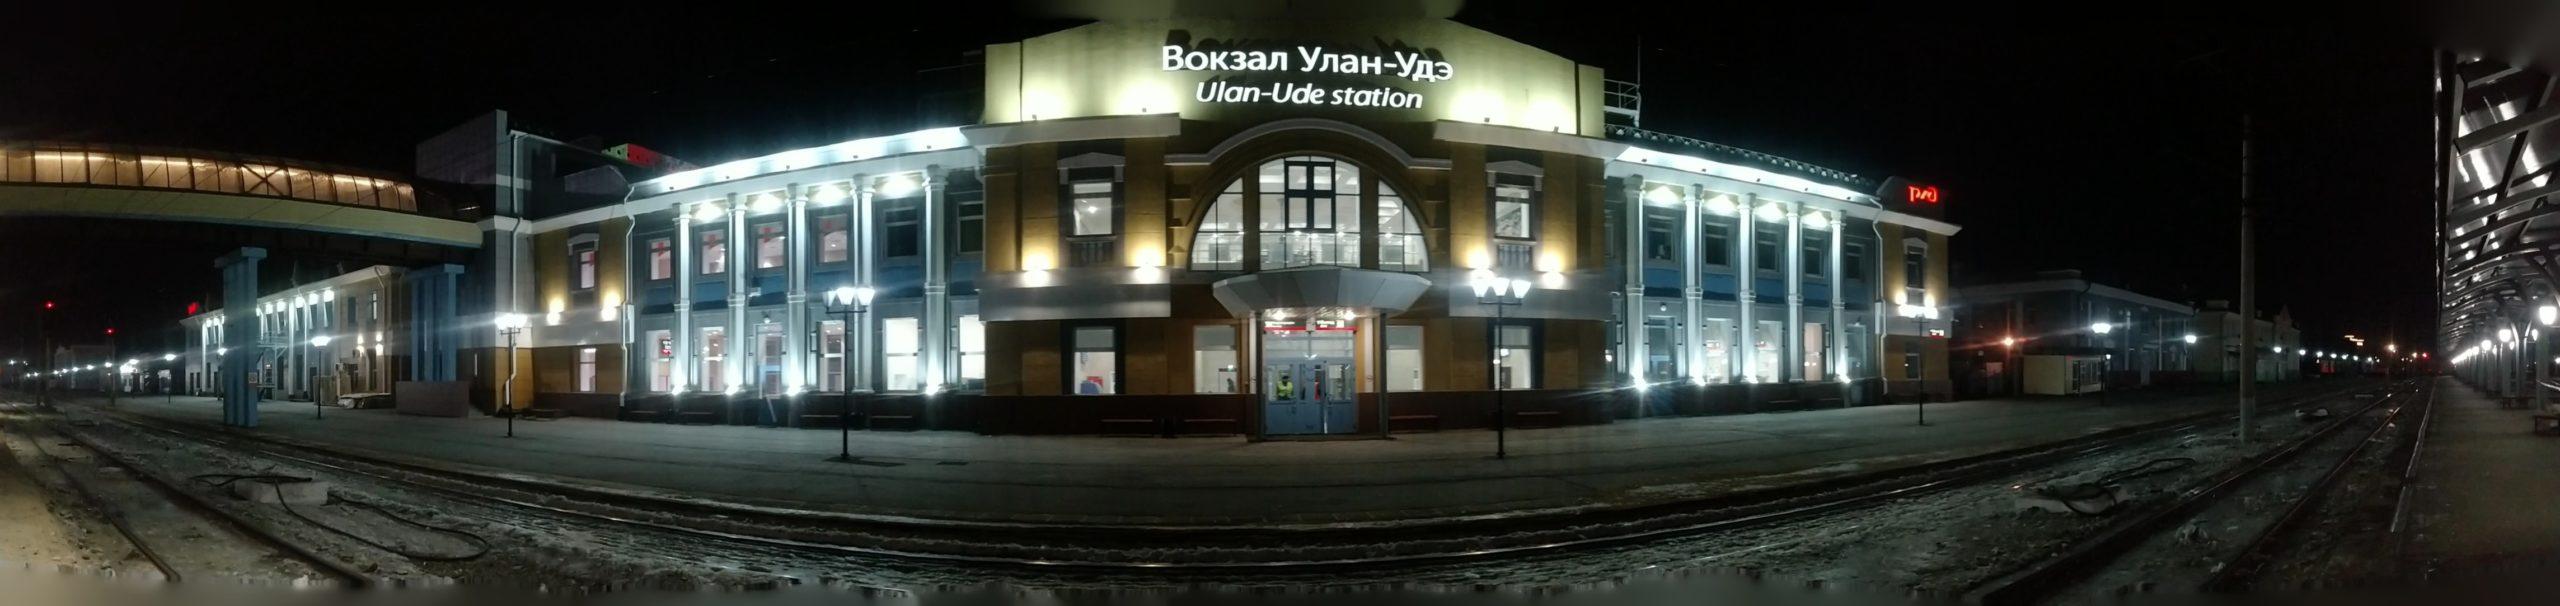 Панорамные фото Вокзал